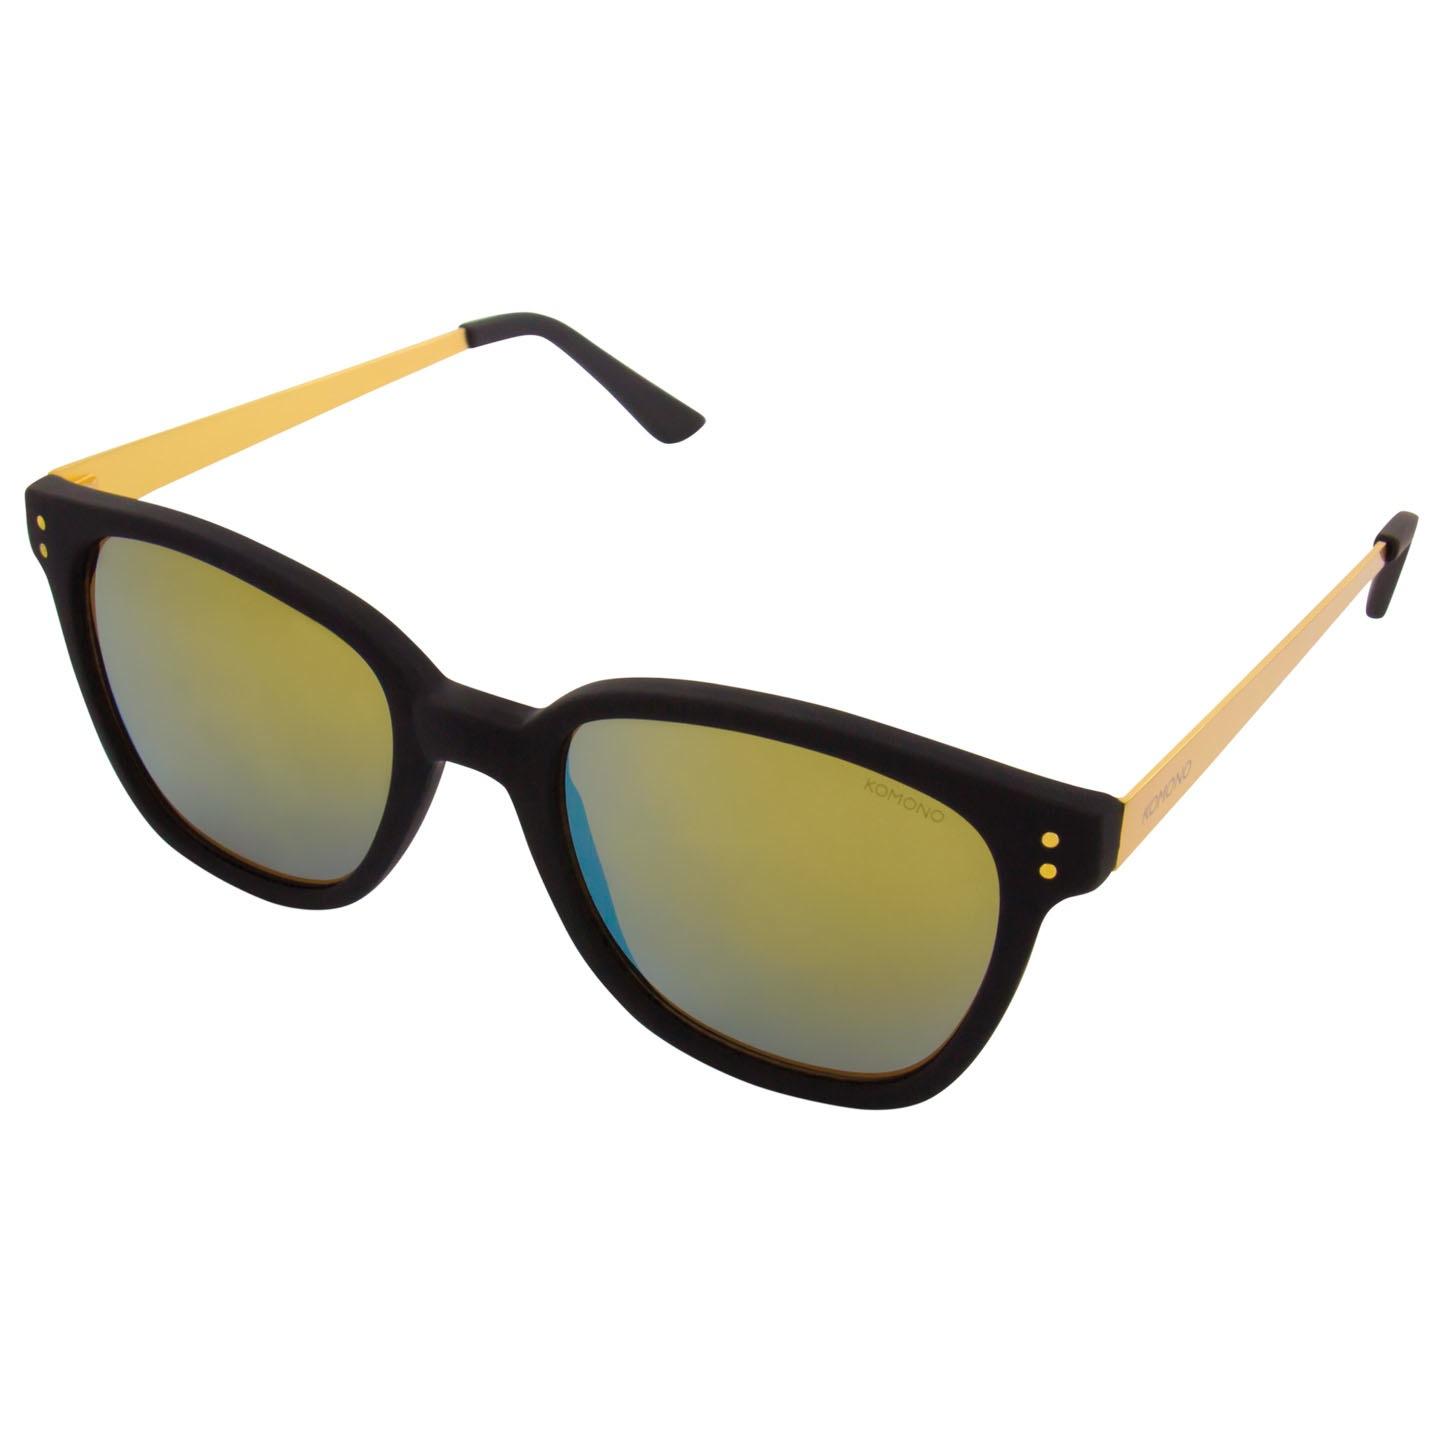 Солнцезащитные очки Komono Renee Metal Black Gold